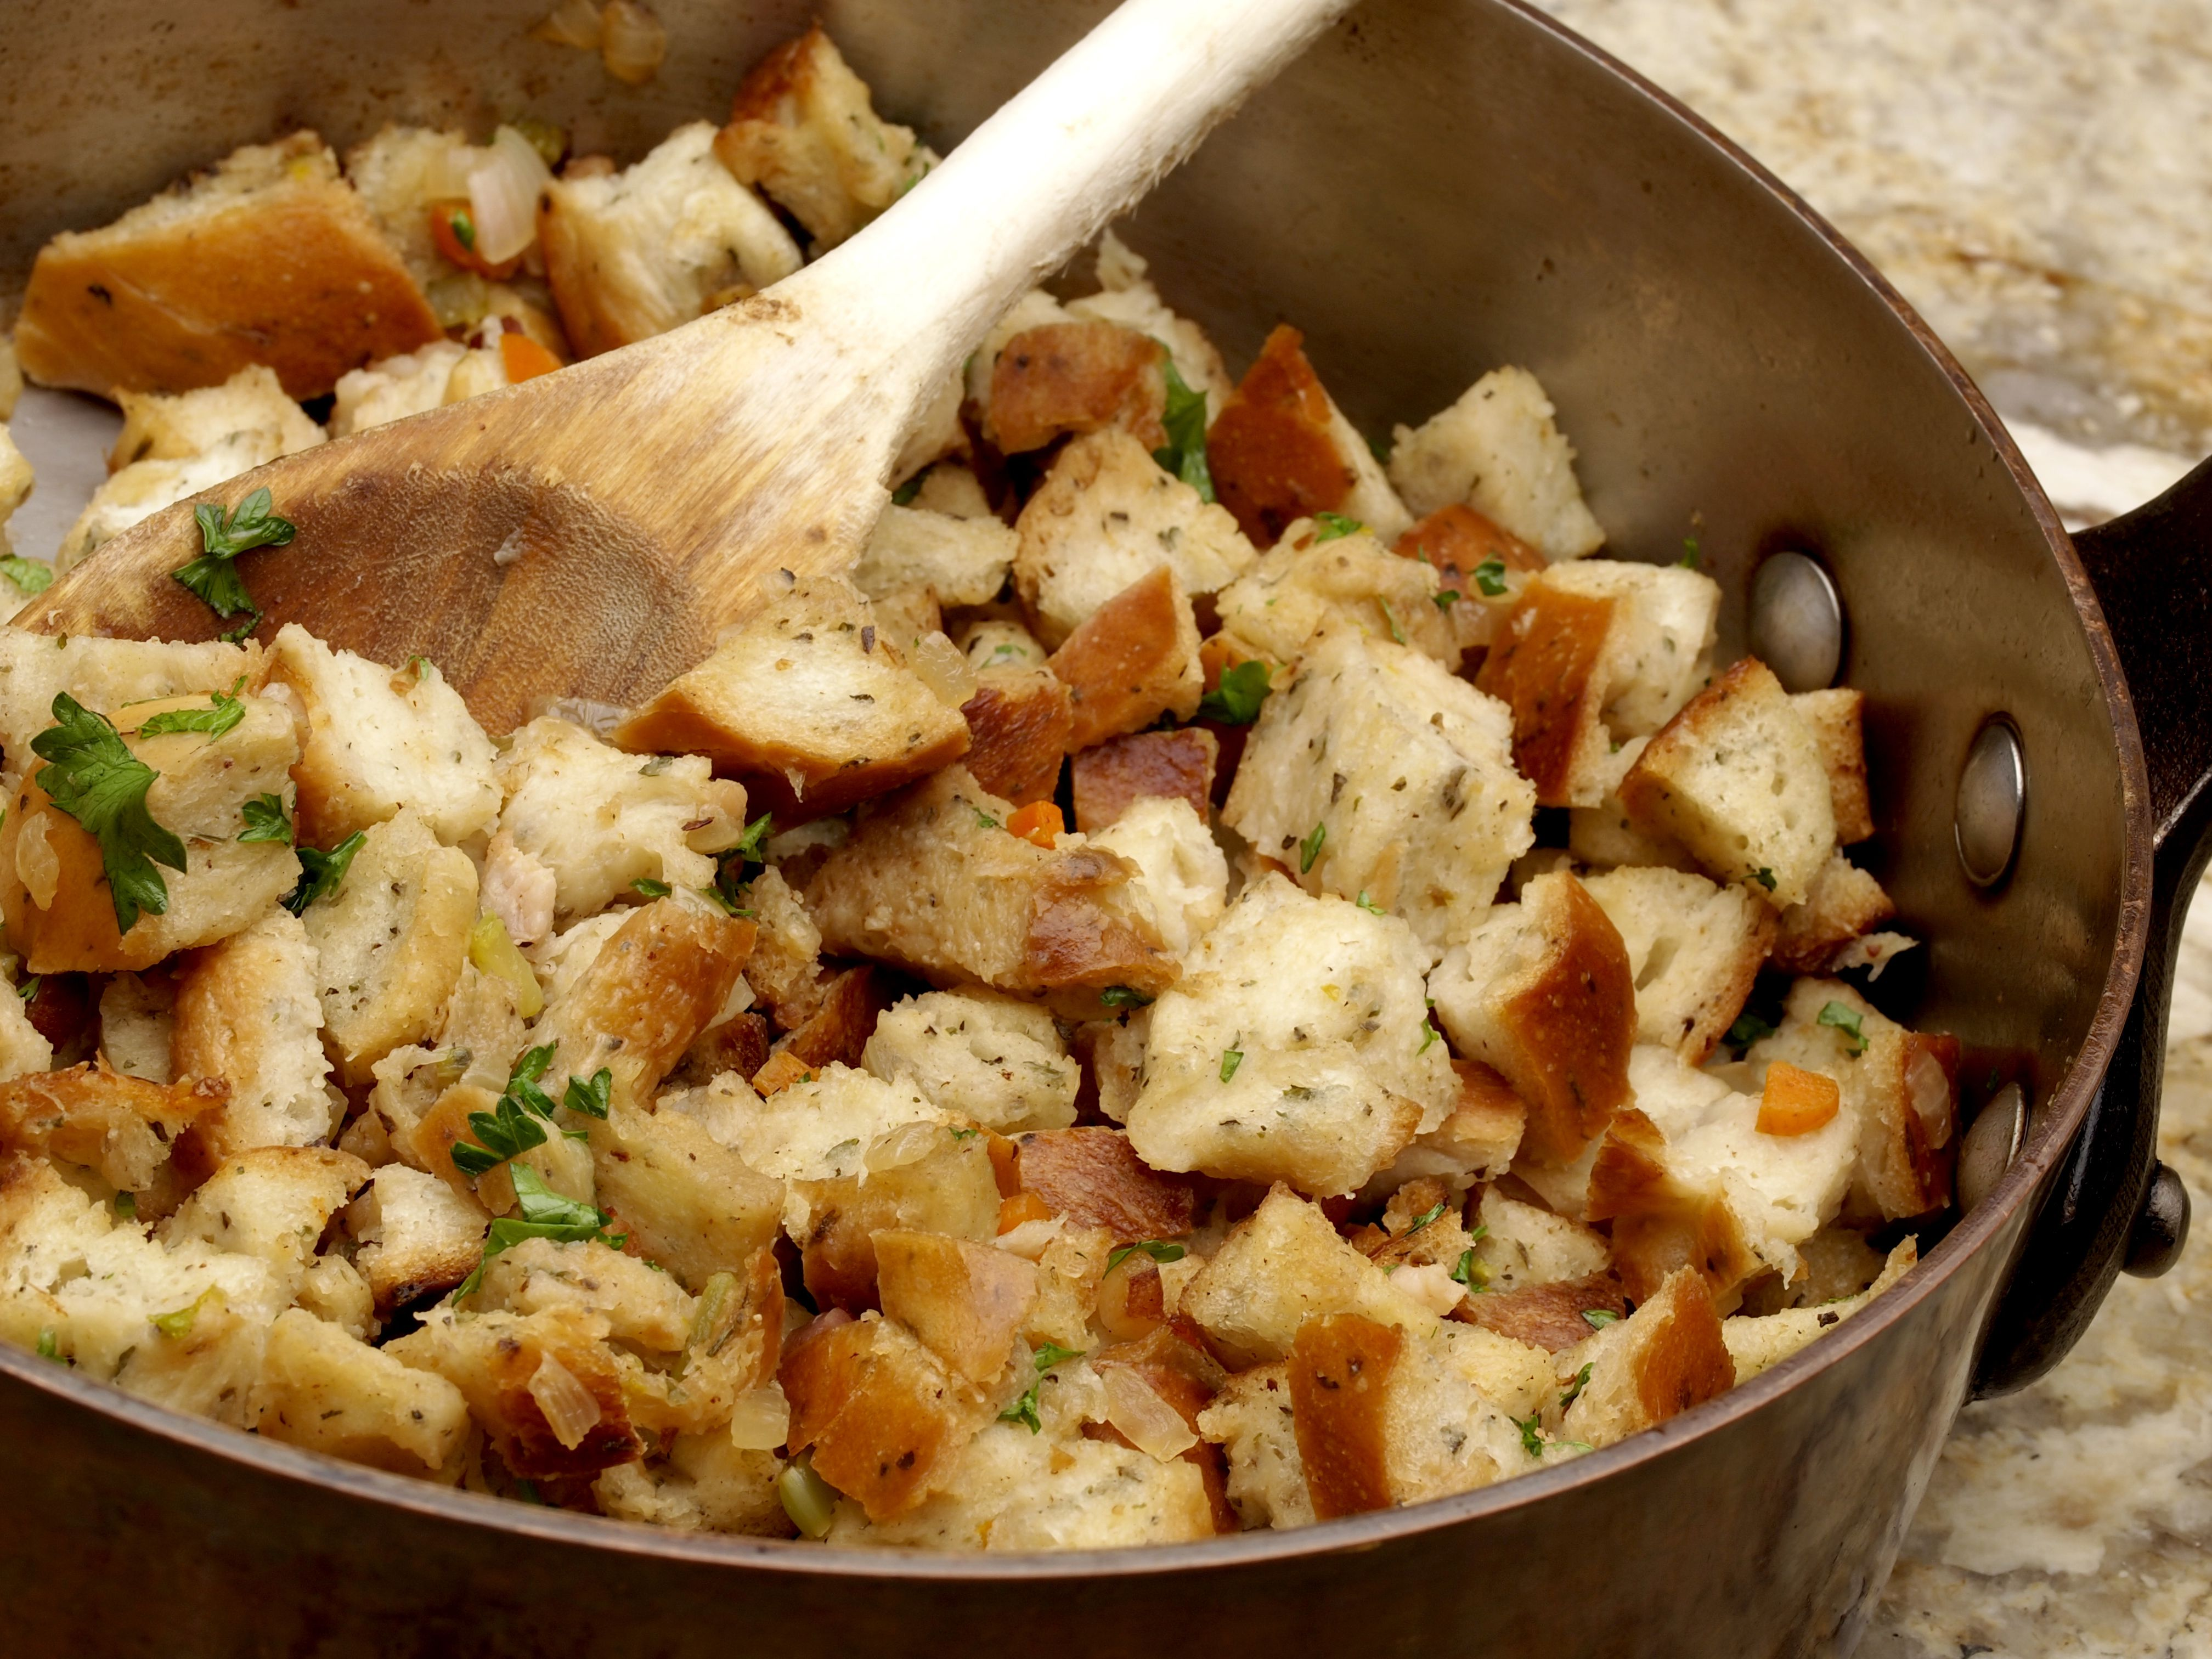 Leftover Turkey Stuffing Casserole Recipe